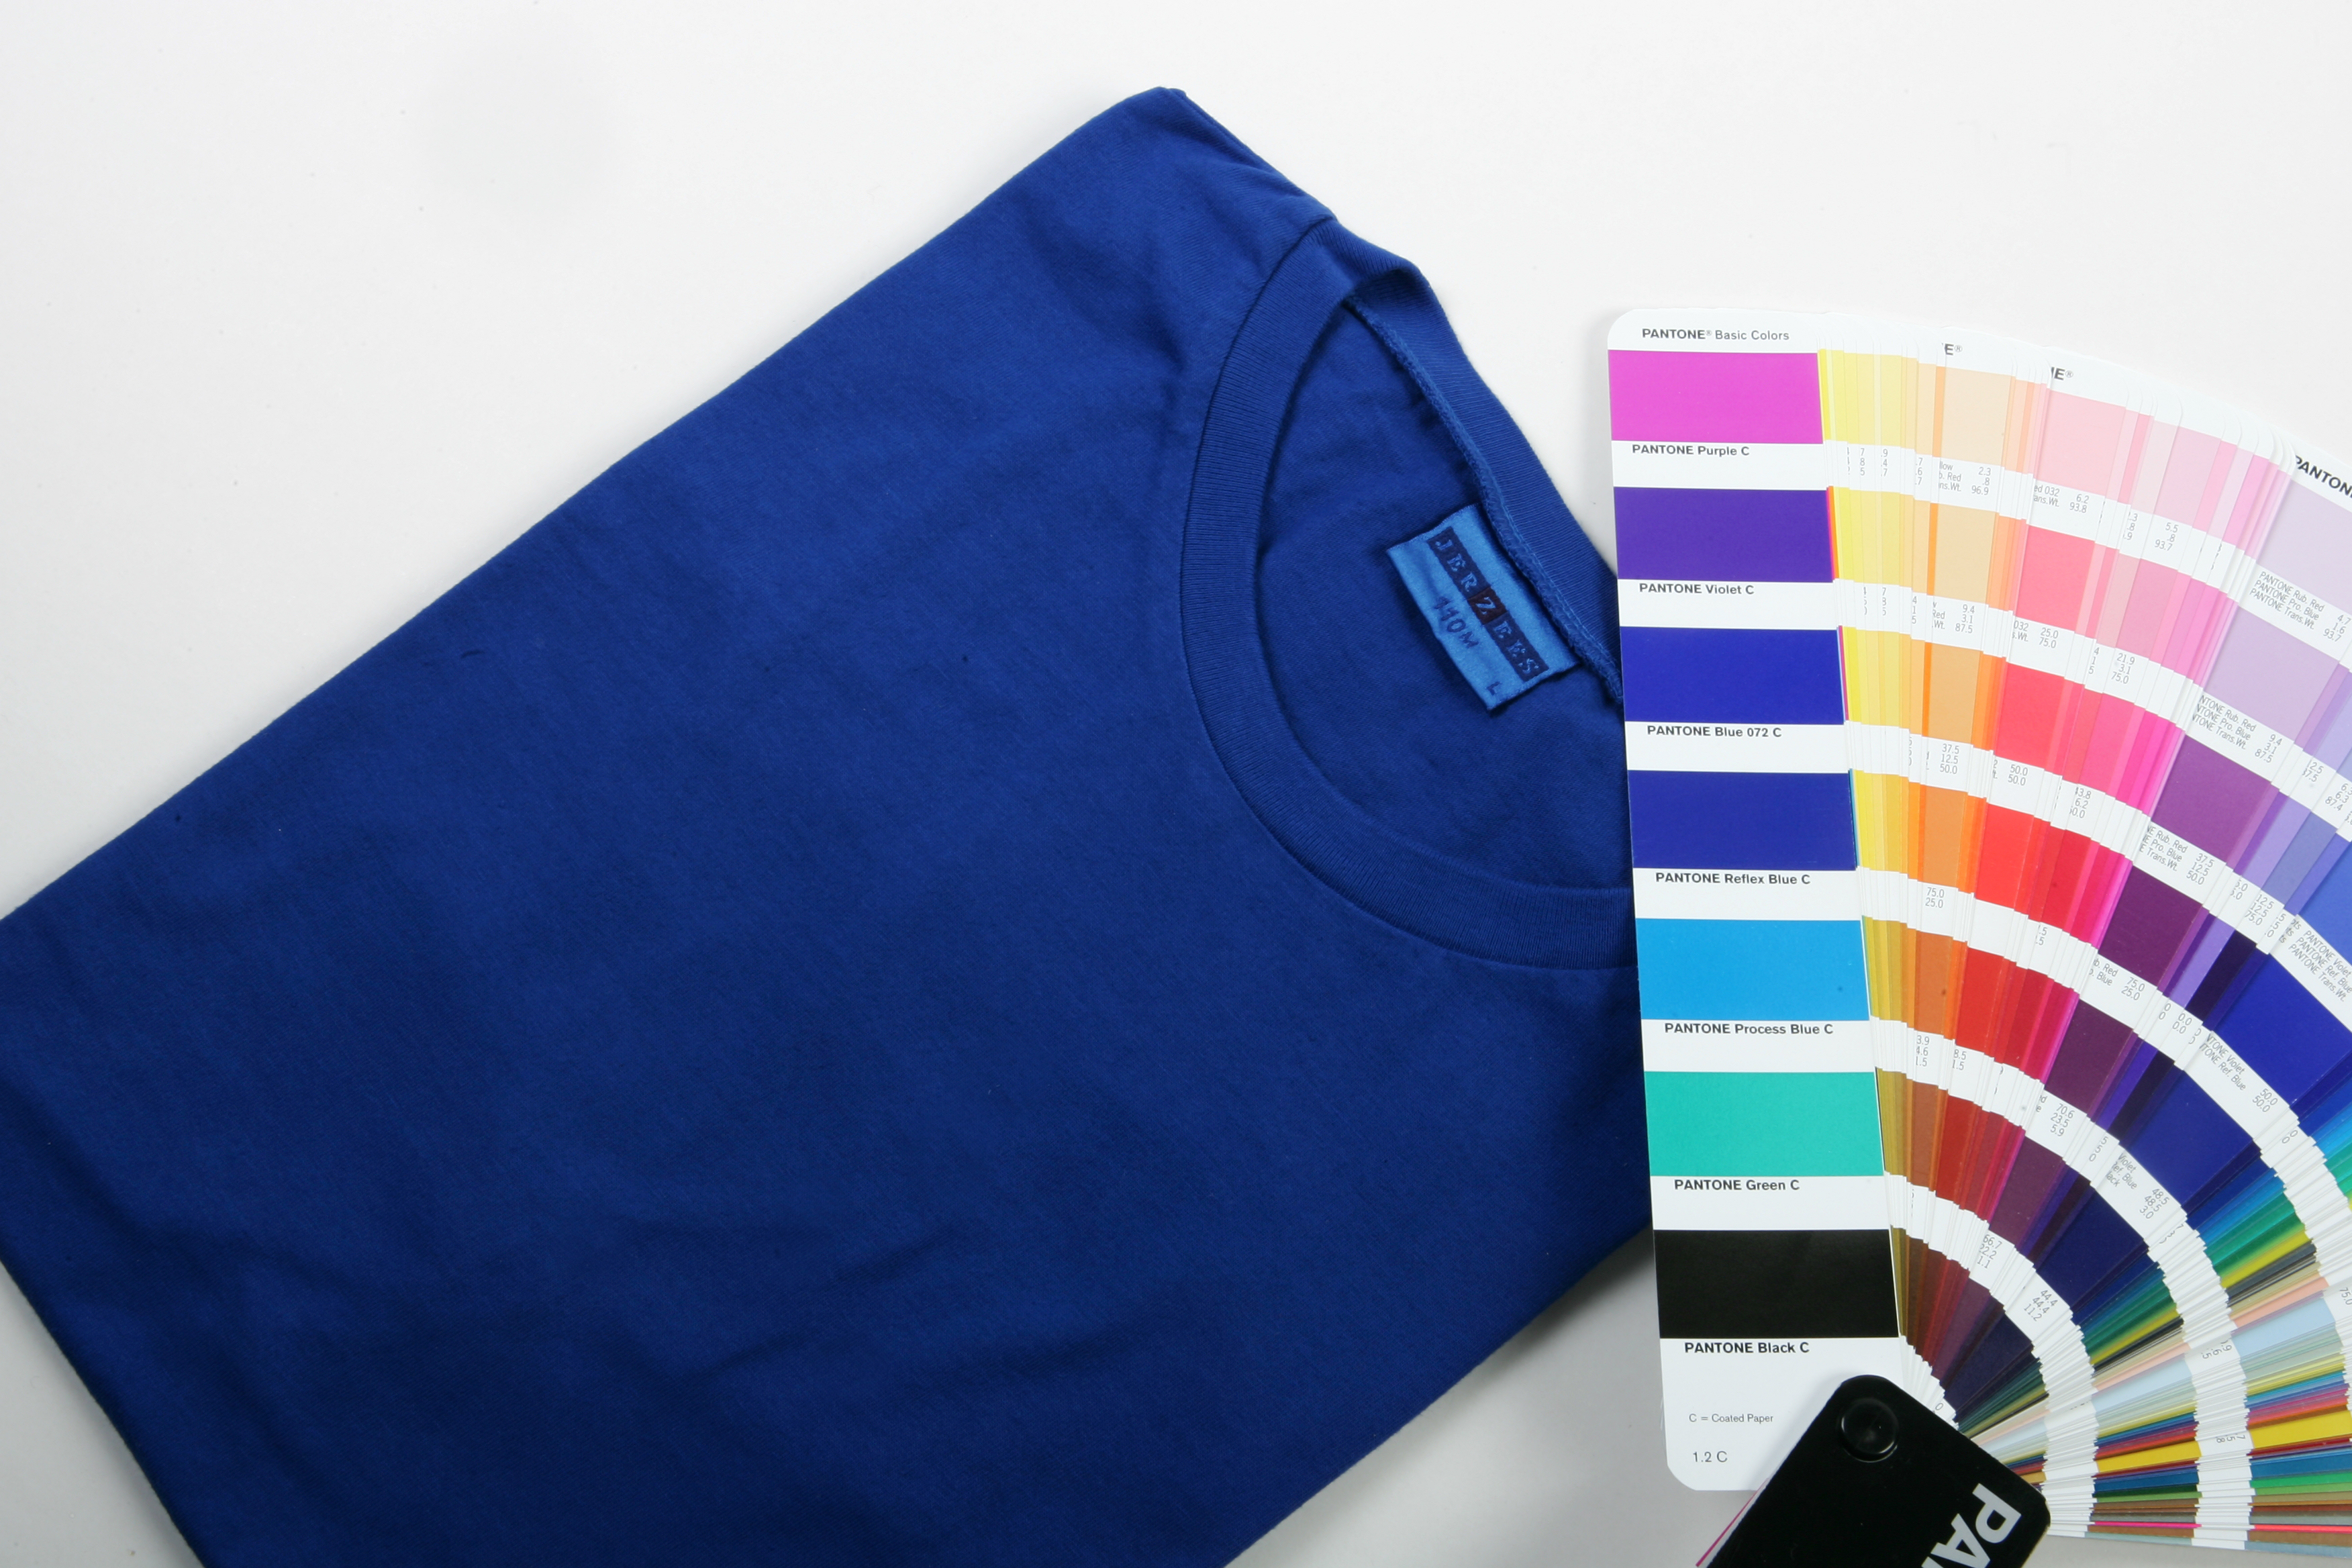 Pantone dyed in Reflex Blue.